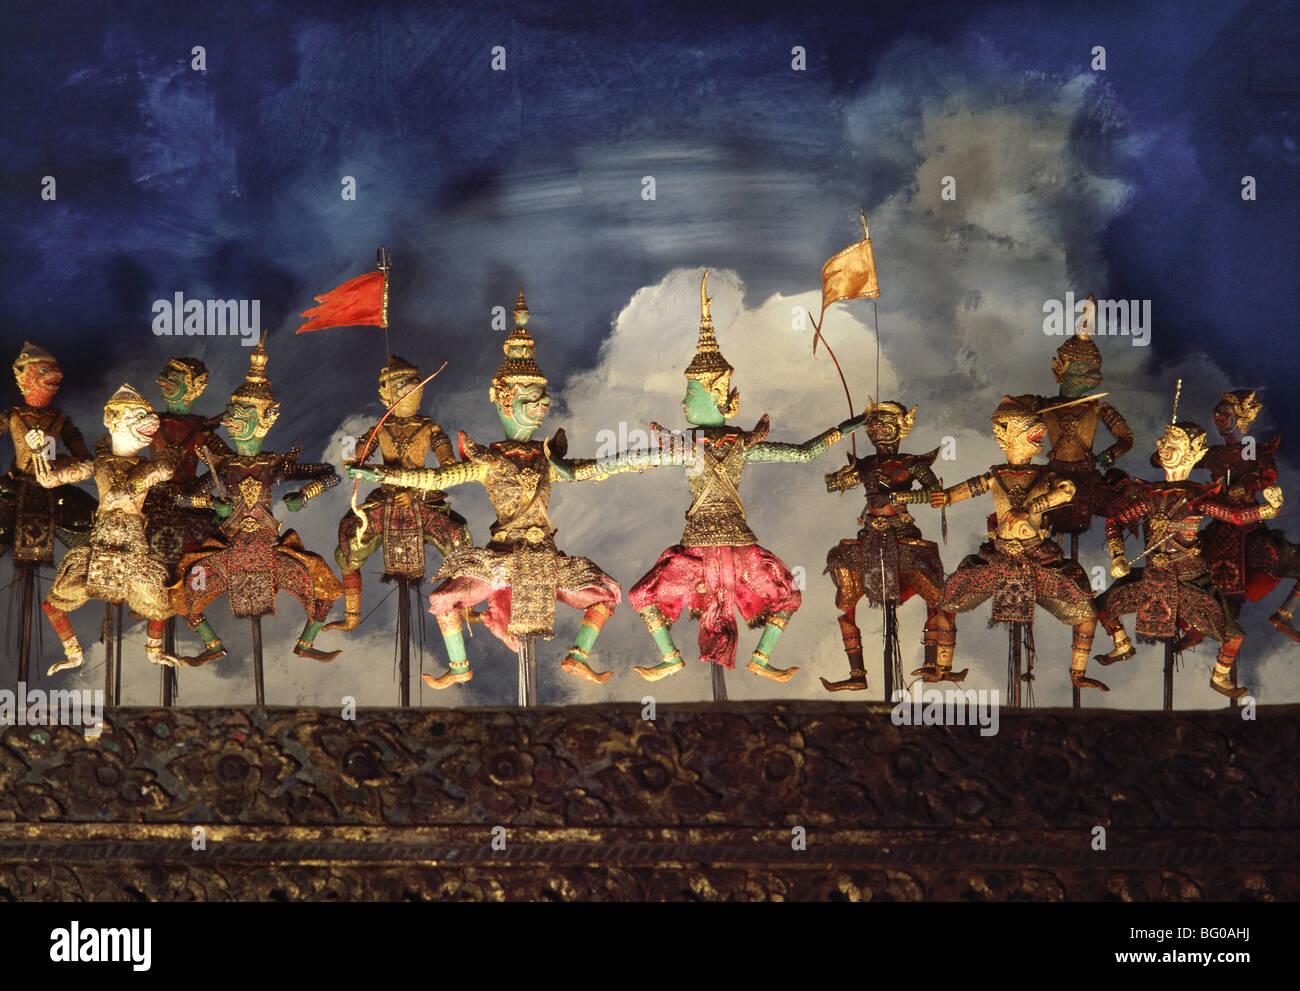 Puppets for Thai puppetry (hun lakhon lek), Bangkok National Museum, Bangkok, Thailand, Southeast Asia, Asia - Stock Image